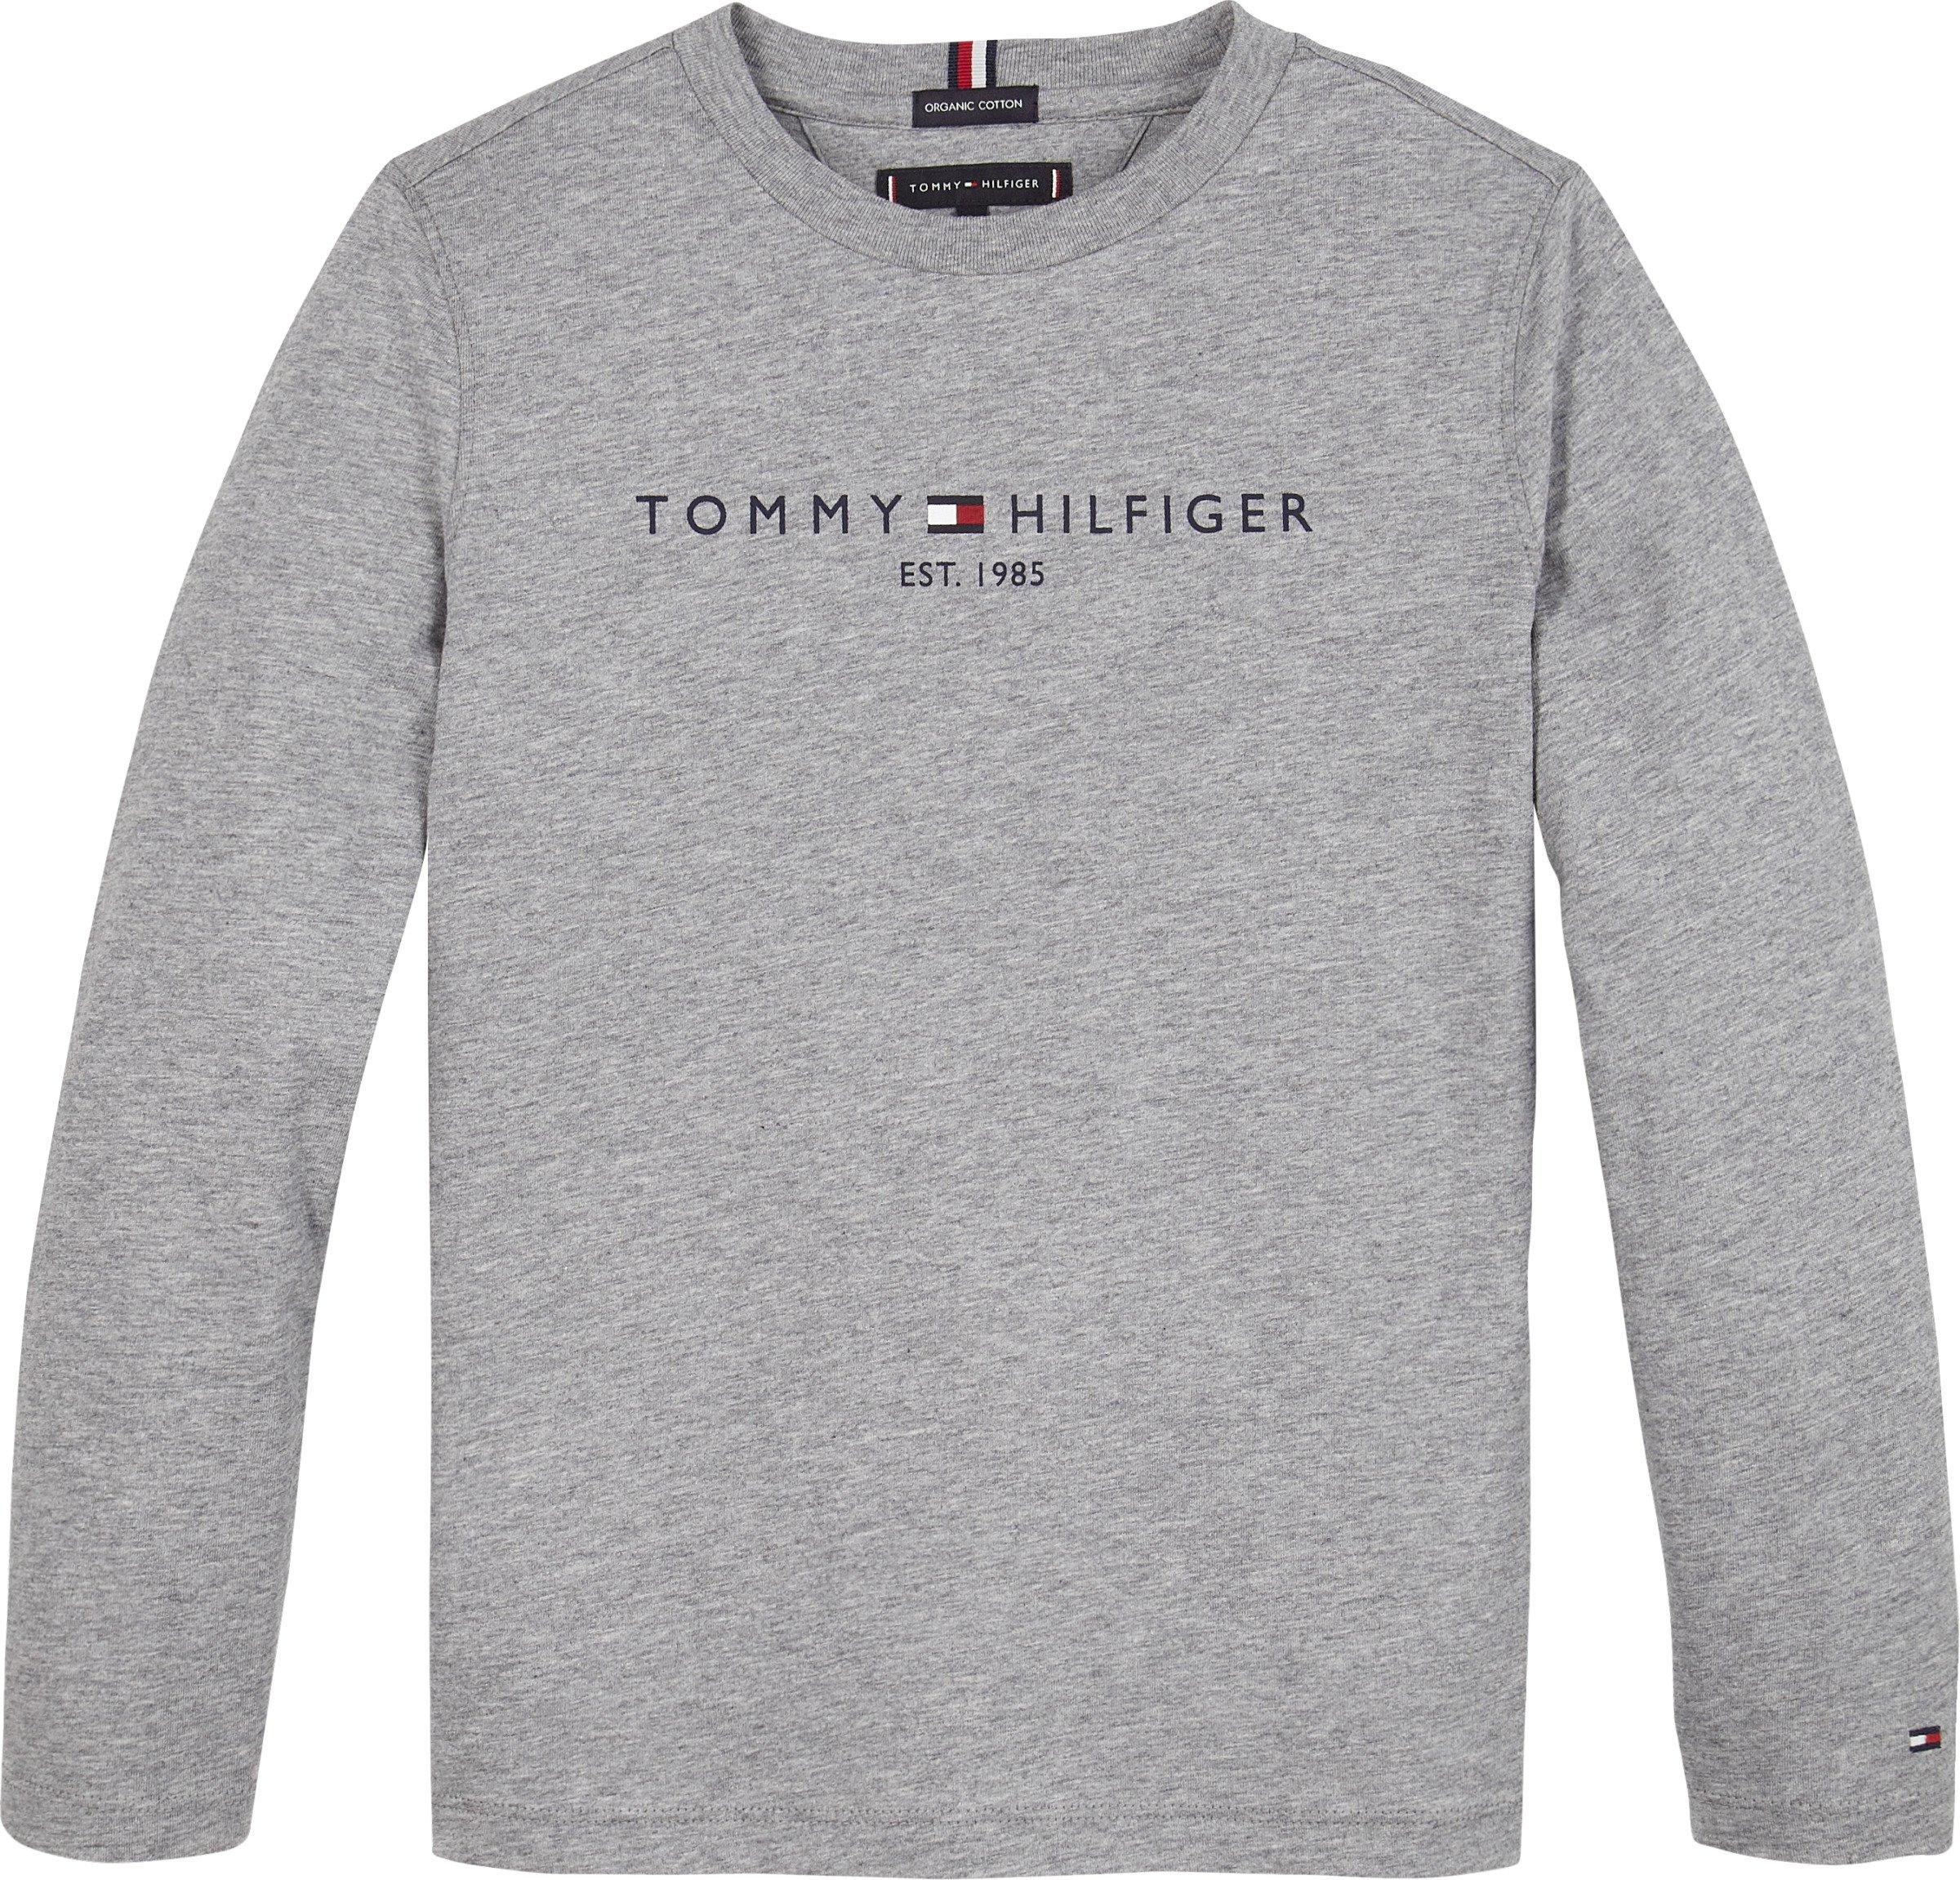 Nuorten Tommy Hilfiger, essential tee l/s, trikoopusero, harmaa